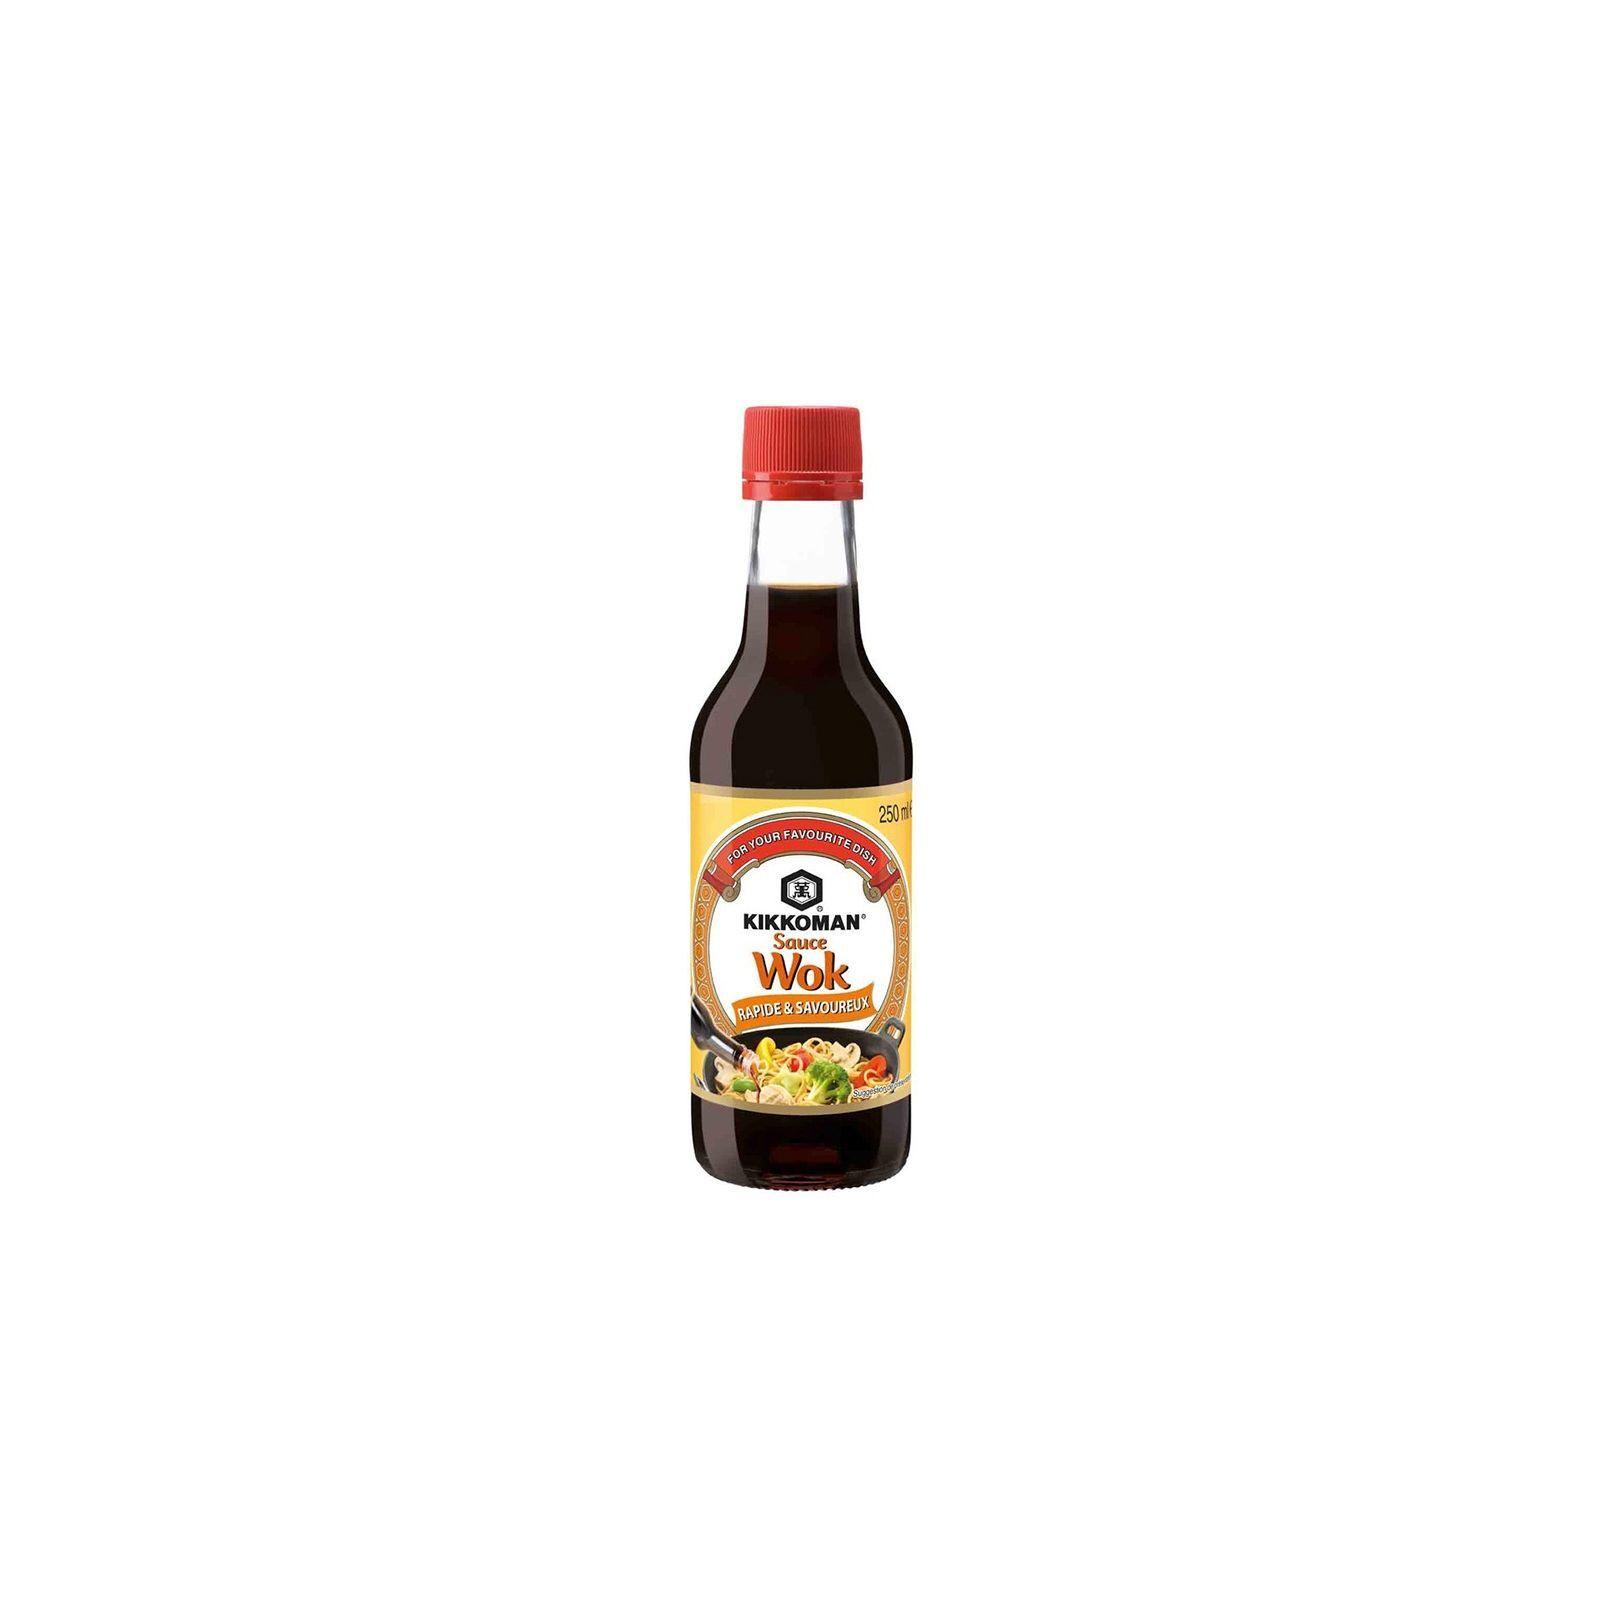 Asia Marché Sauce Wok Sukiyaki Kikkoman 250ml